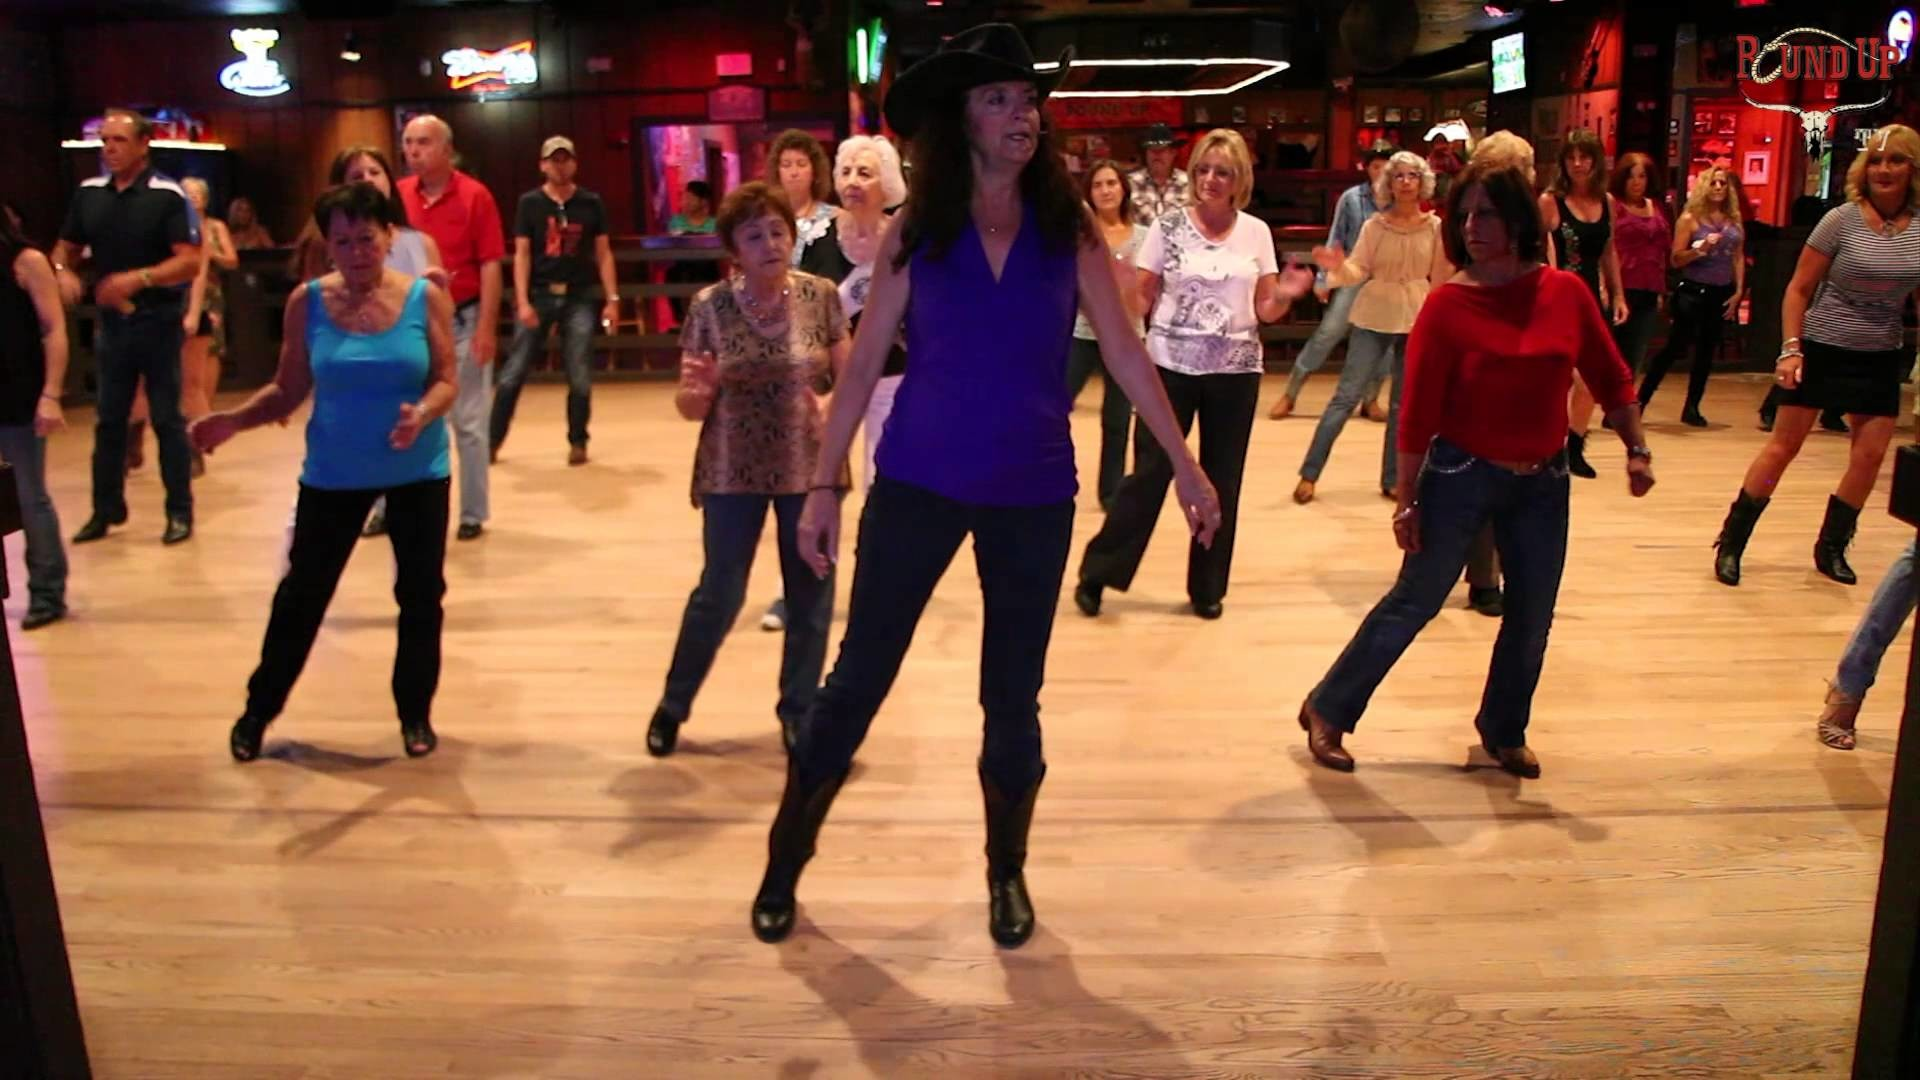 Round Up Country Western Nightclub – Line Dance Martina McBride Wild Night  – YouTube